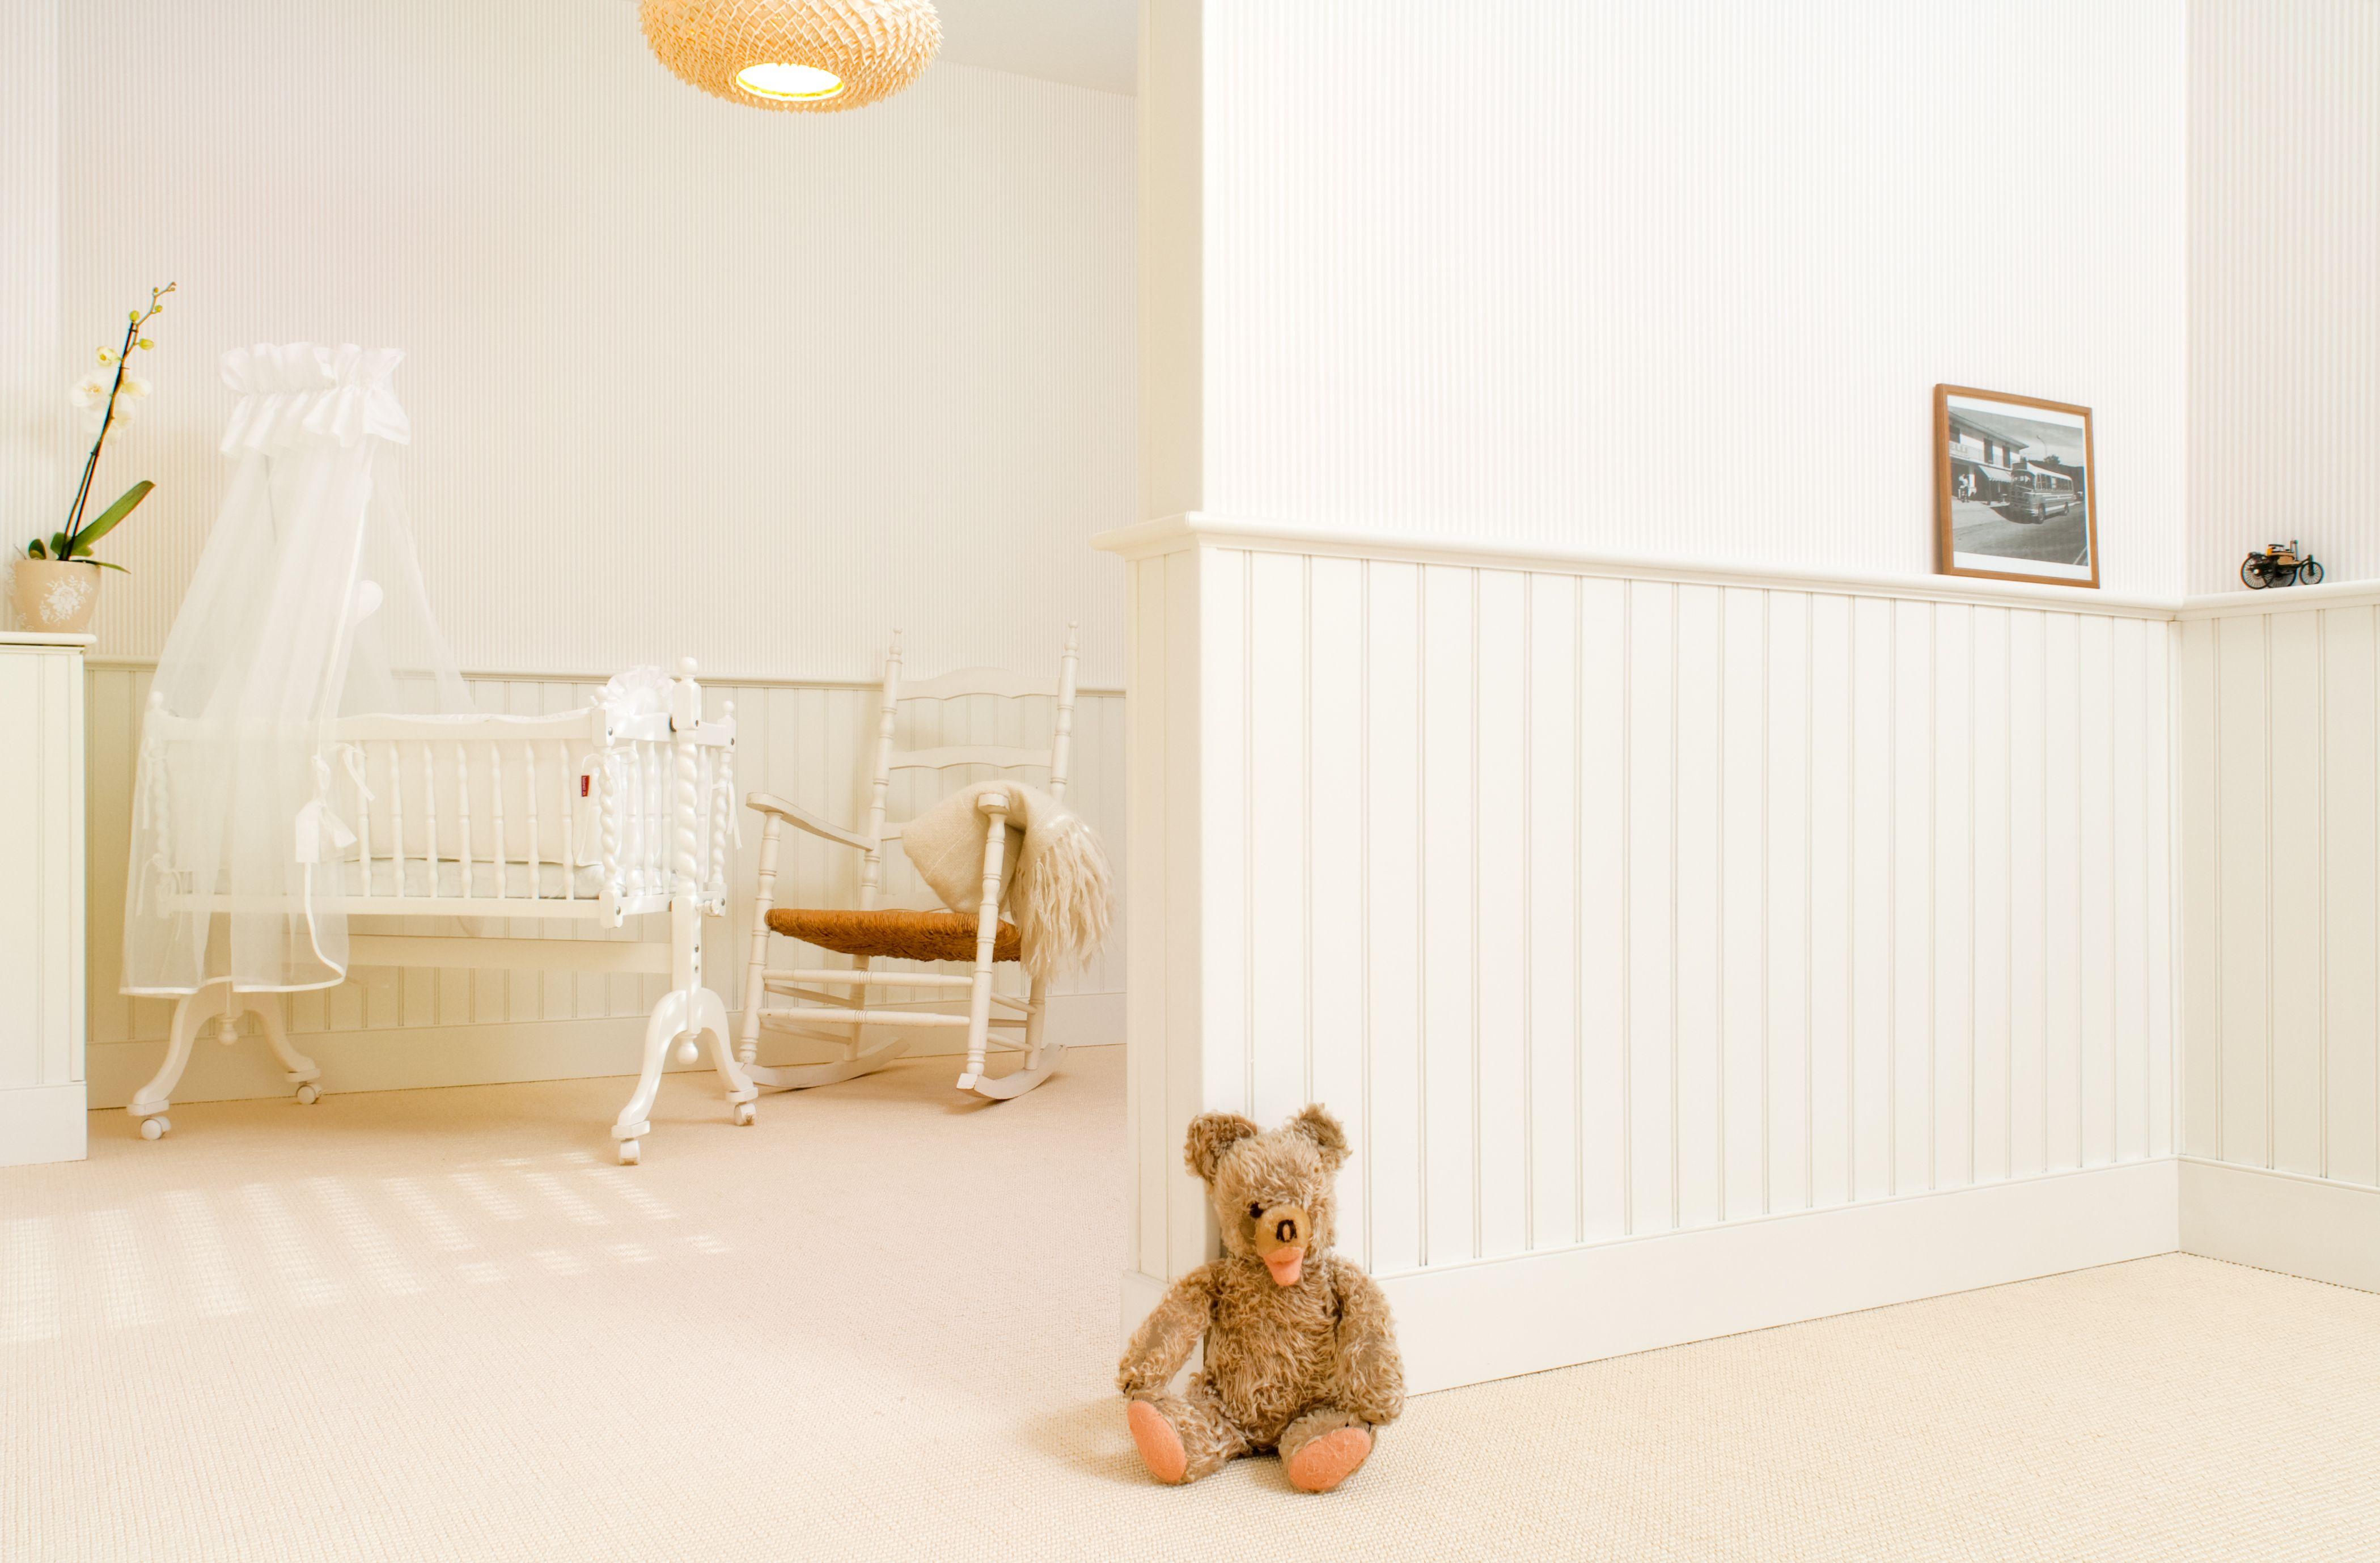 Kinderzimmer, wainscoting, beadboard, Holzpaneele